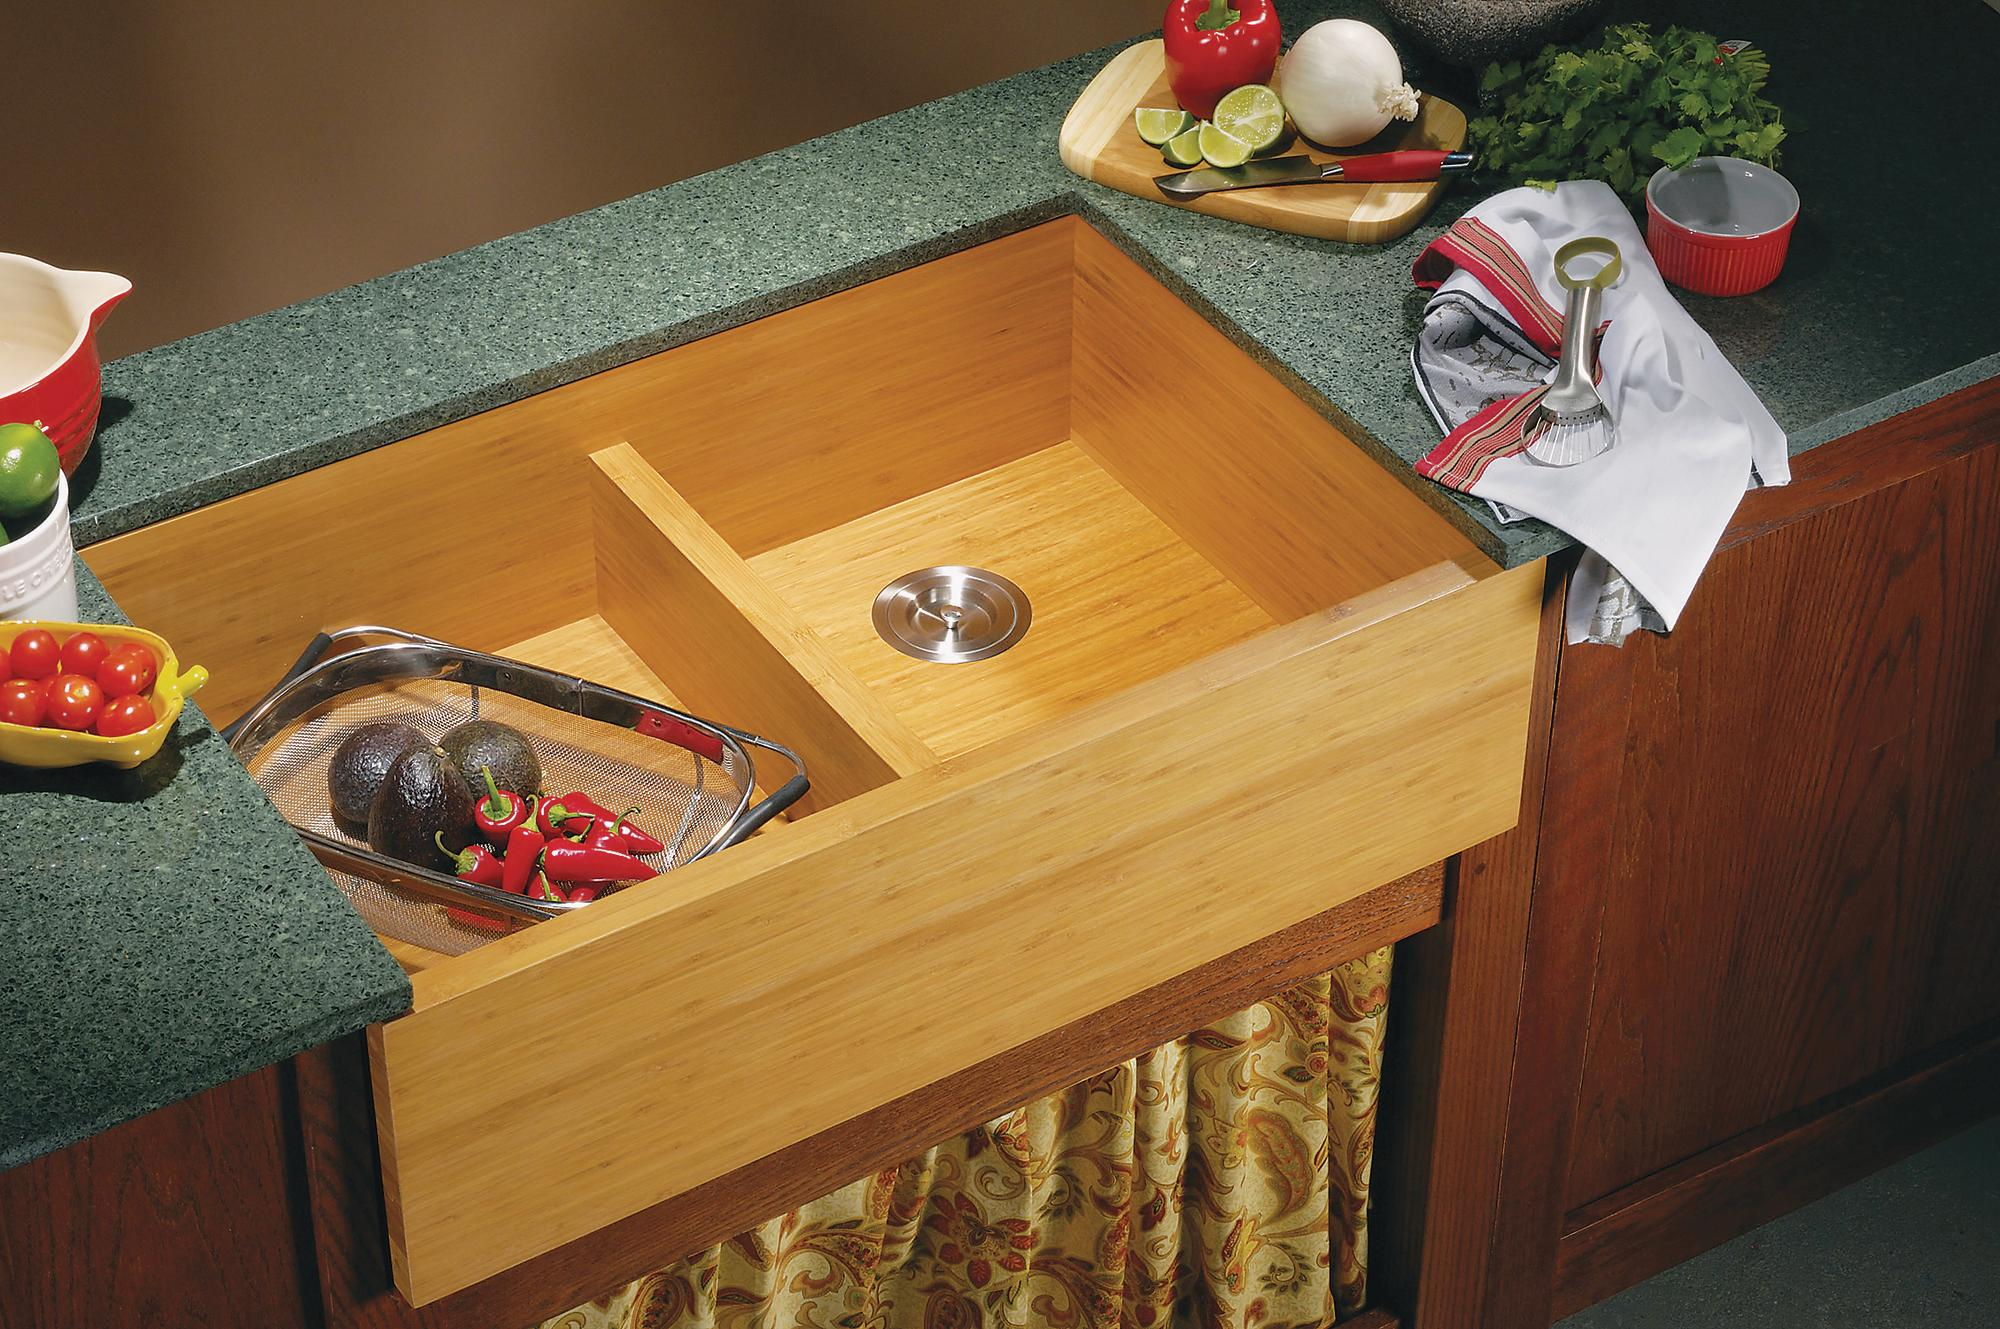 Lenova Bamboo Kitchen Sink